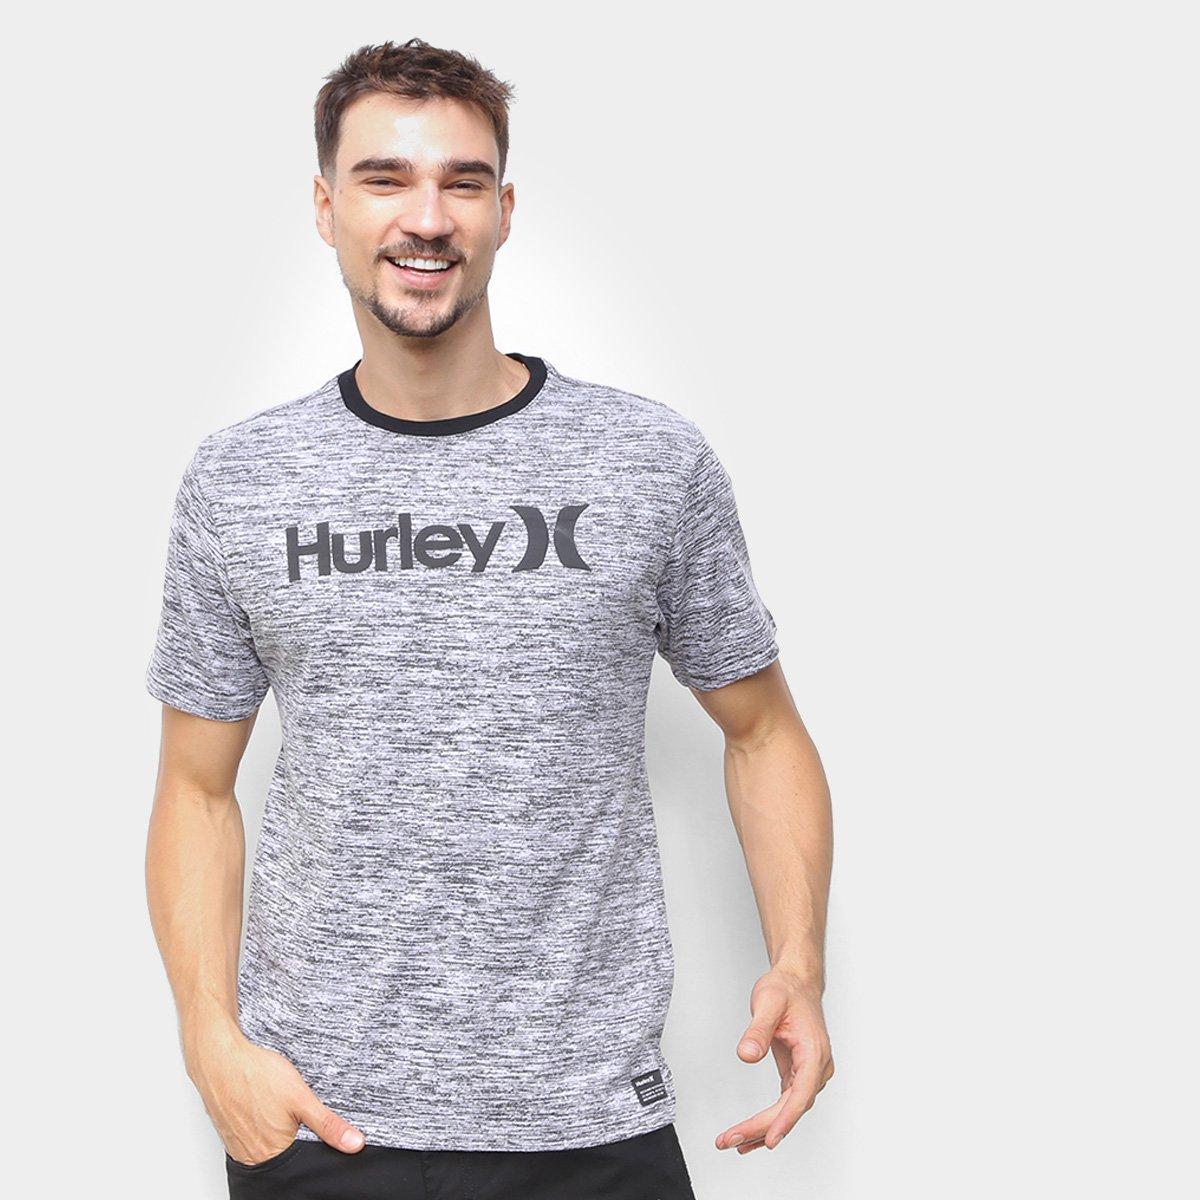 Camiseta Hurley Mosaico One Masculina